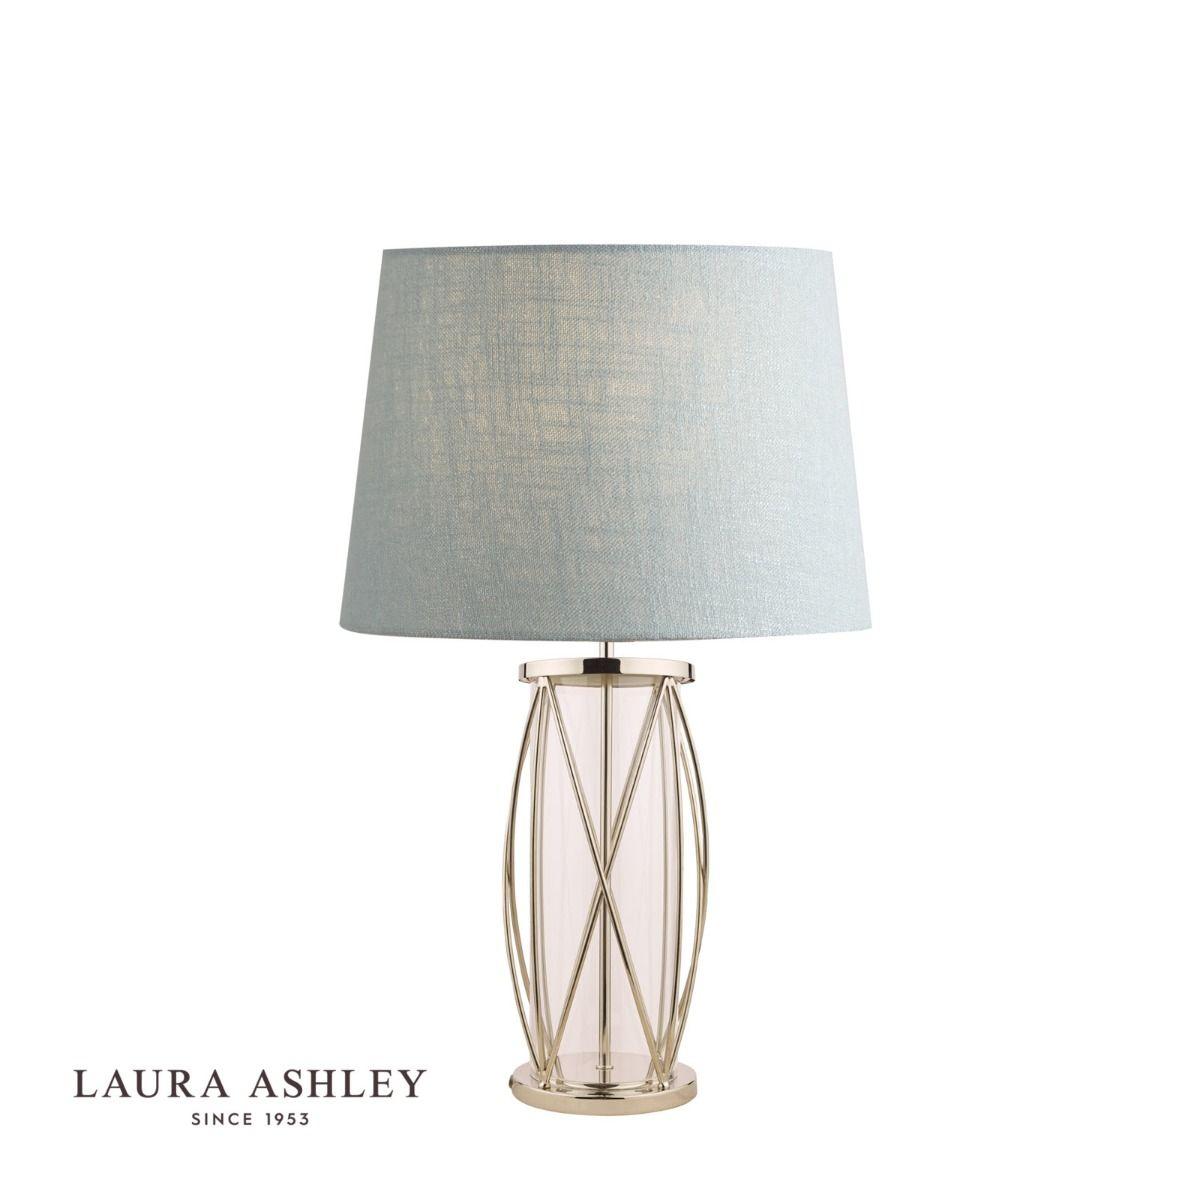 laura ashley beckworth polished nickel